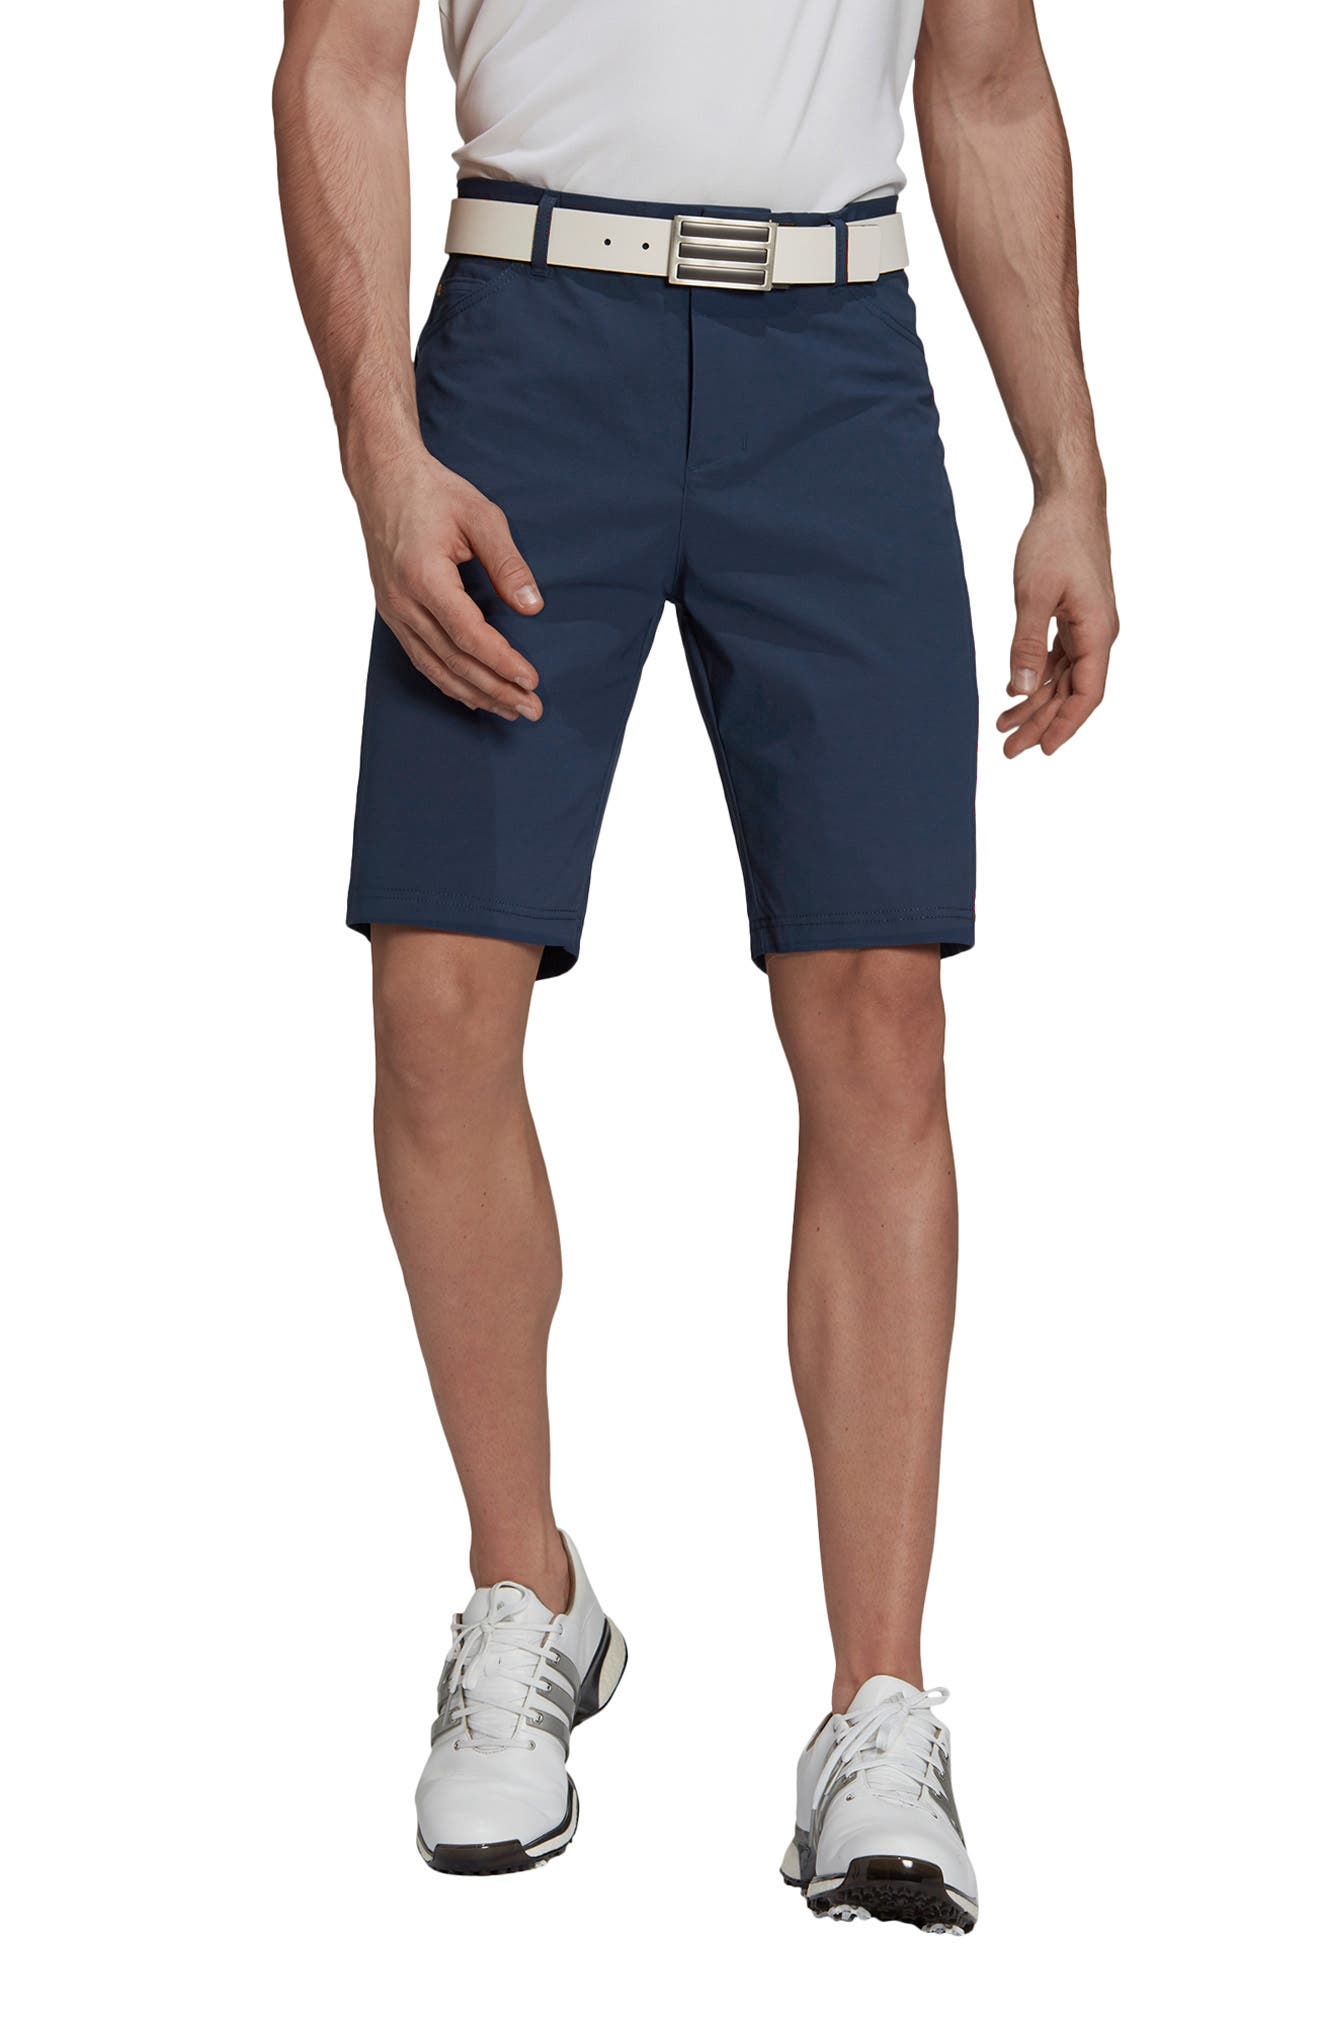 Men's Adidas Golf Men's Go-To Water Repellent Five Pocket Shorts